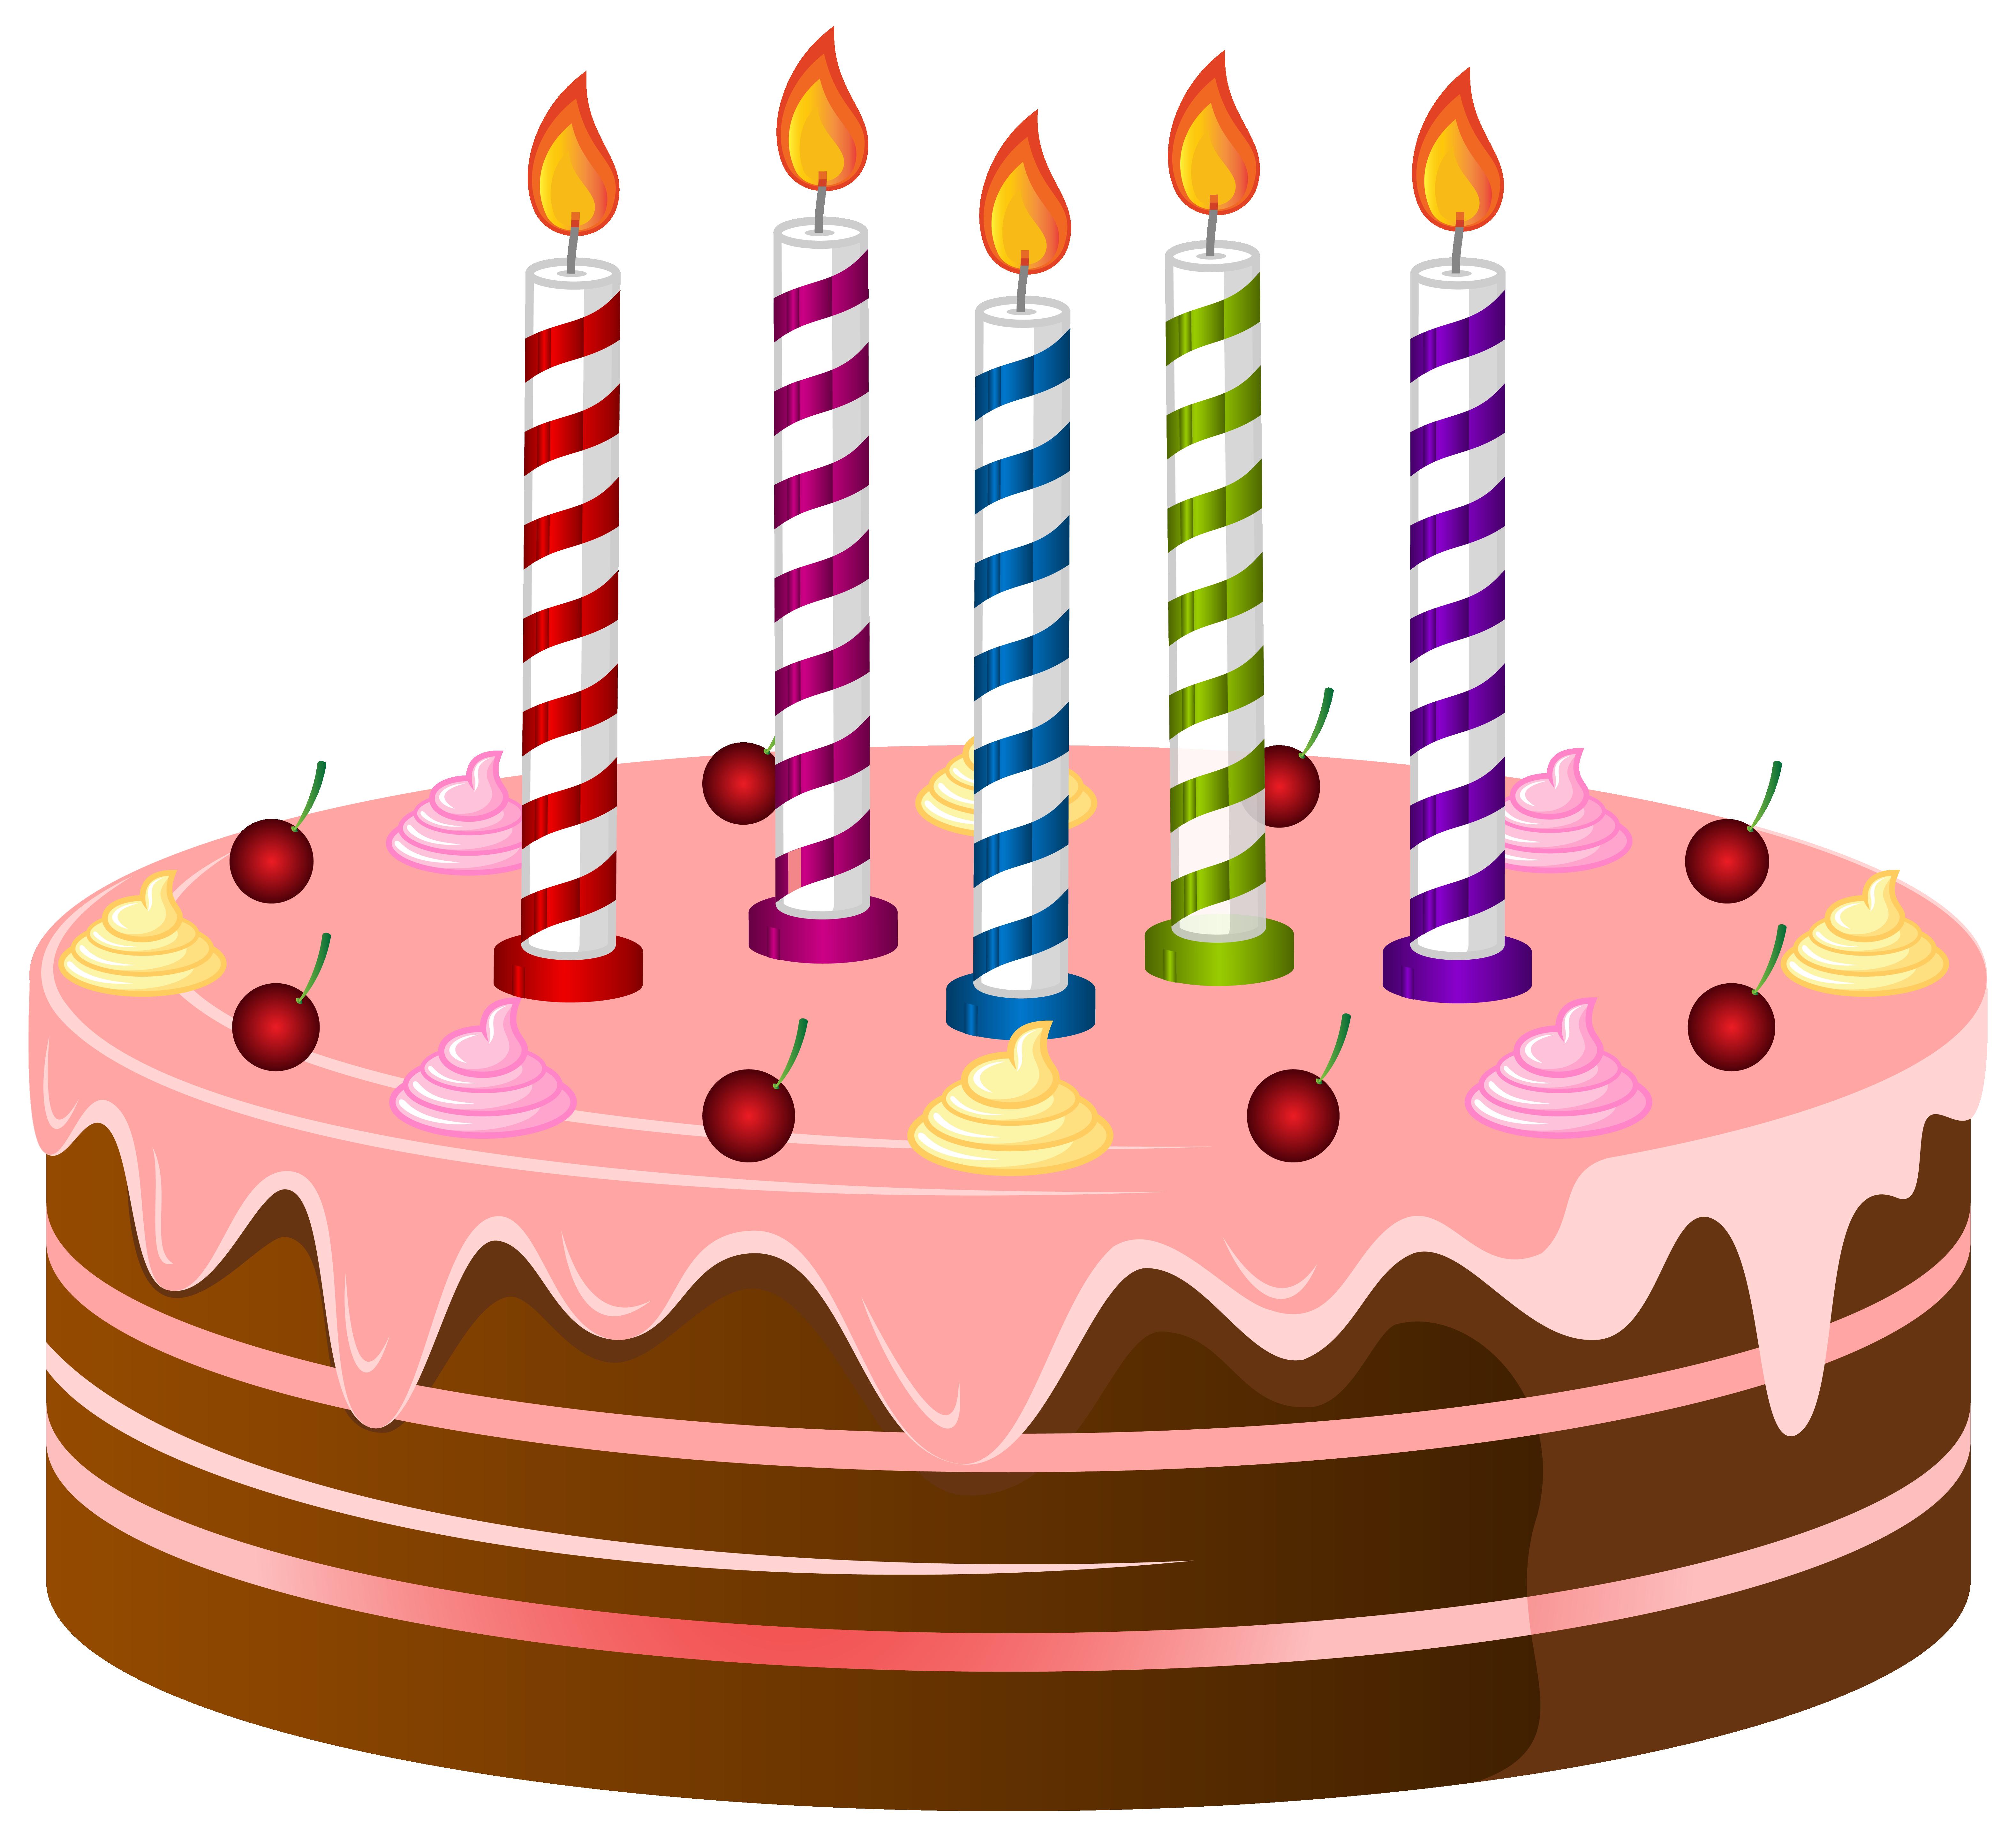 6315x5754 Birthday Cake Clip Art Happy Clipart 2 Image